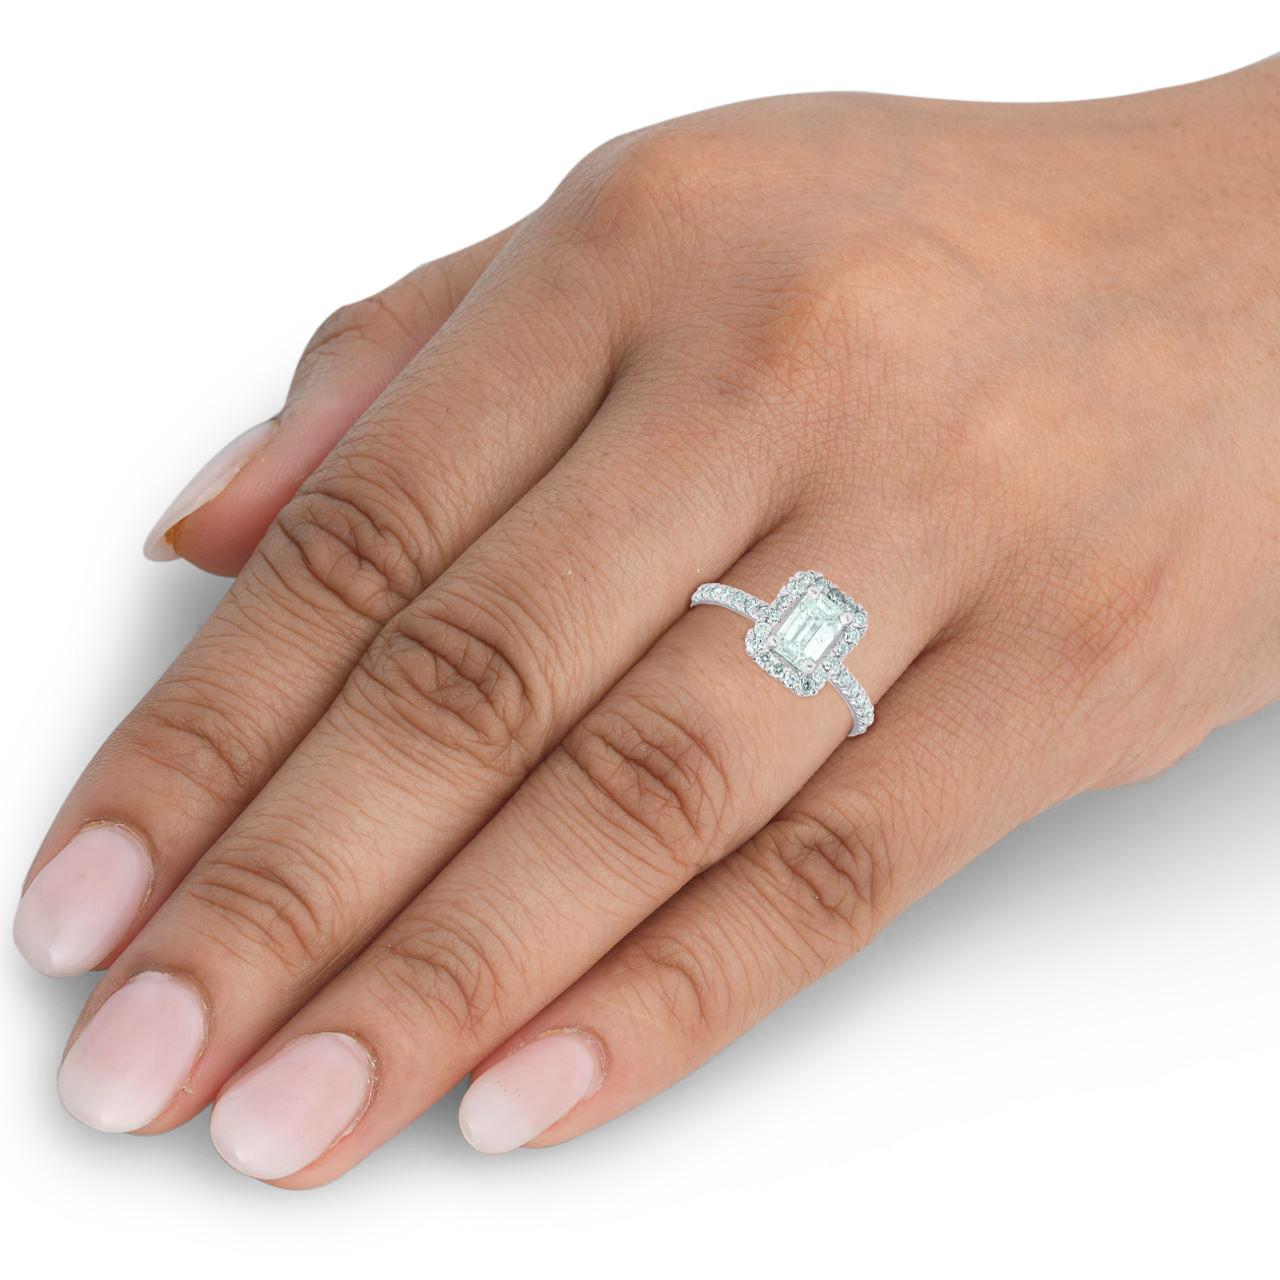 20dfce4663e93 1 1/2 Ct Emerald Cut Diamond Halo Engagement Ring 14k White Gold (H/I,  SI2-I1)